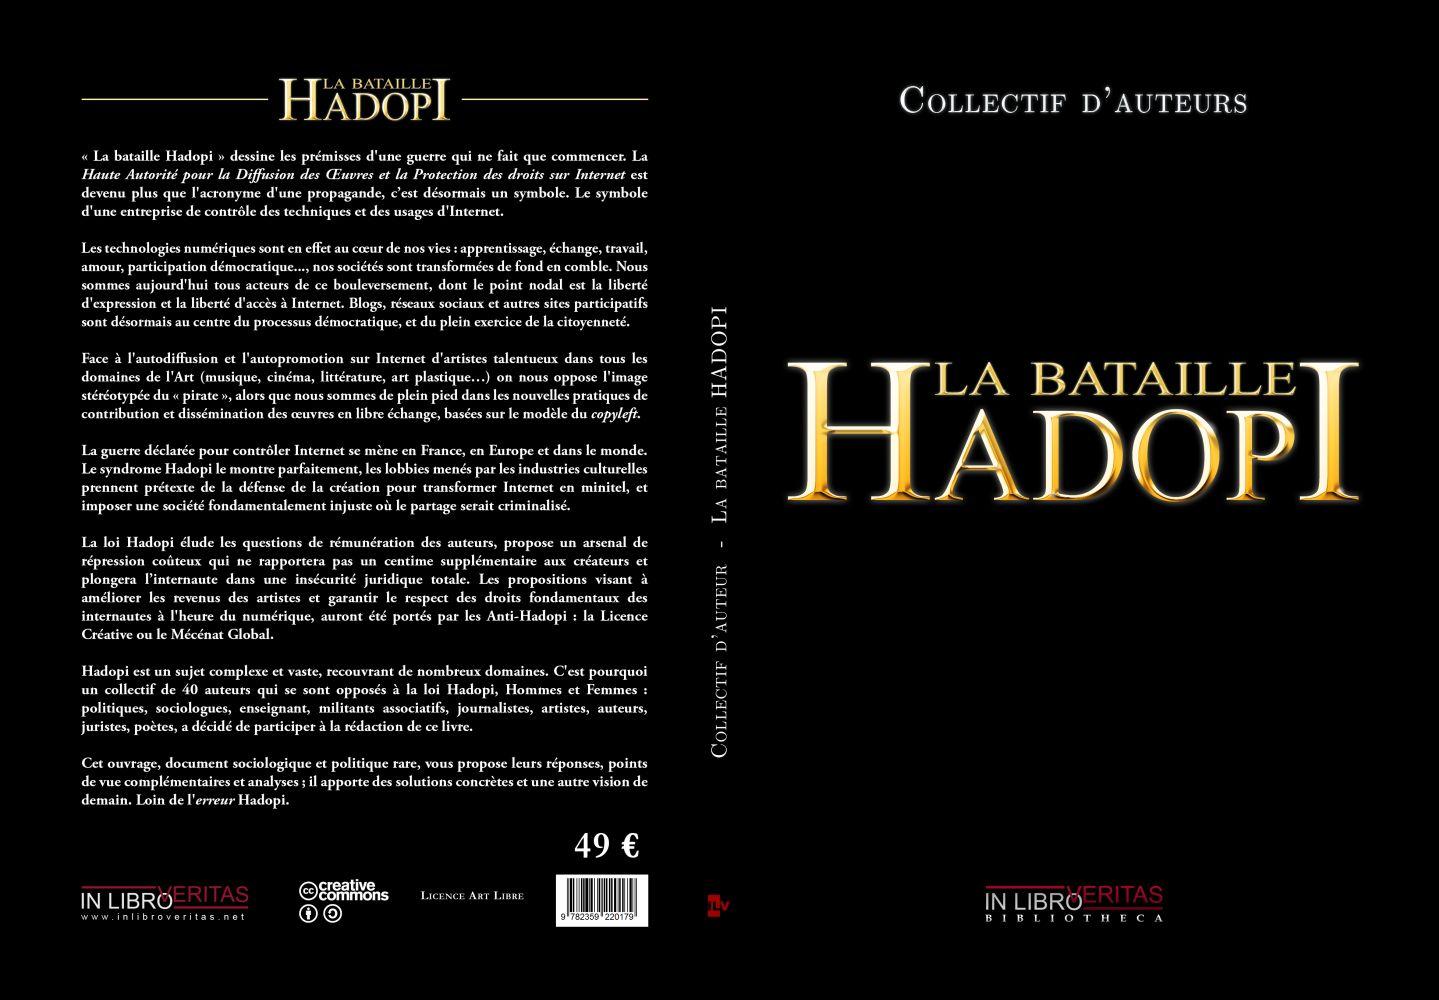 livre explicatif de la loi Hadopi et des débats qu'elle provoque